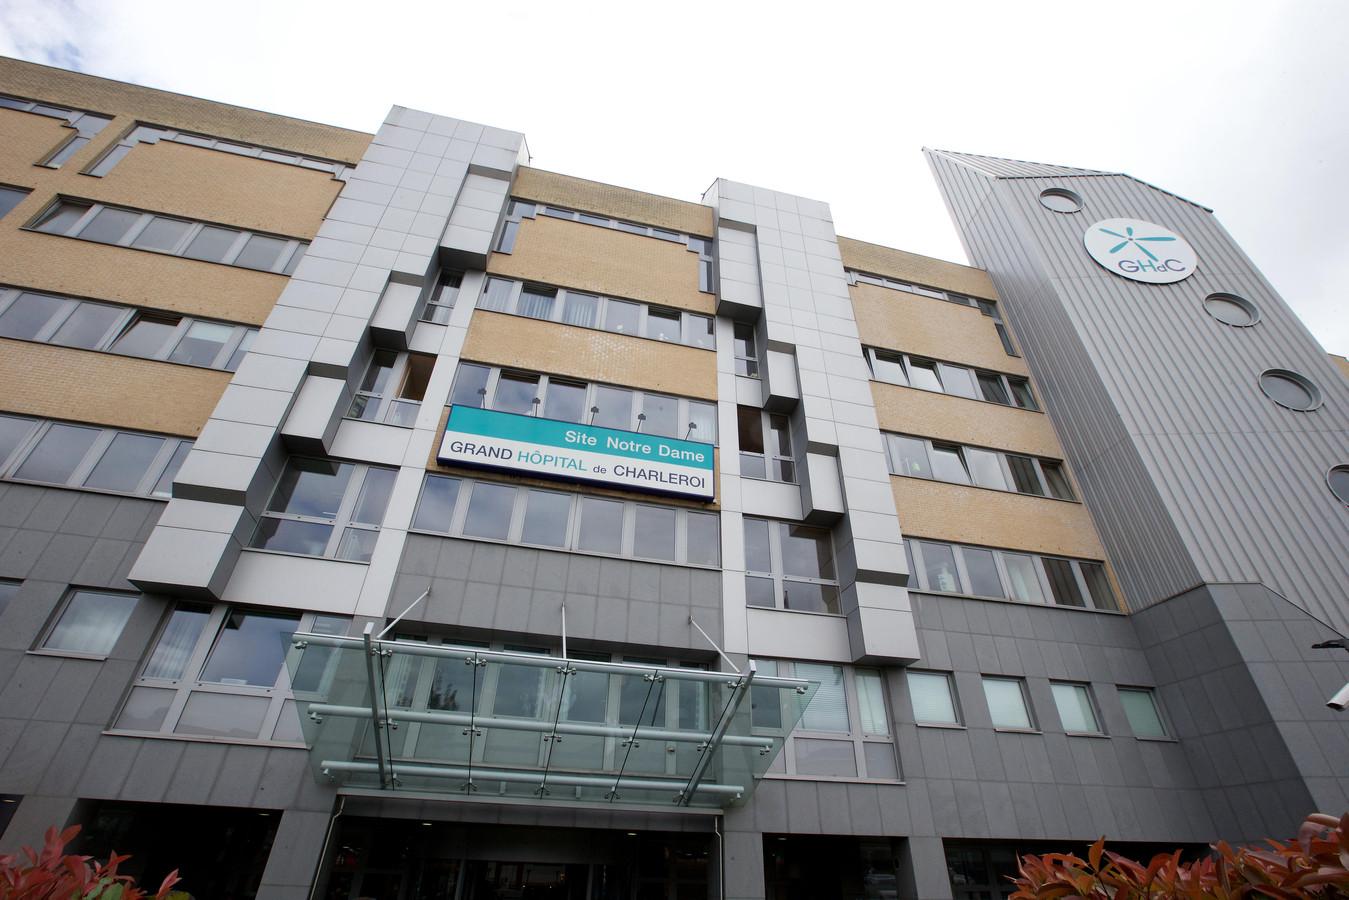 Grand Hôpital de Charleroi Notre Dame